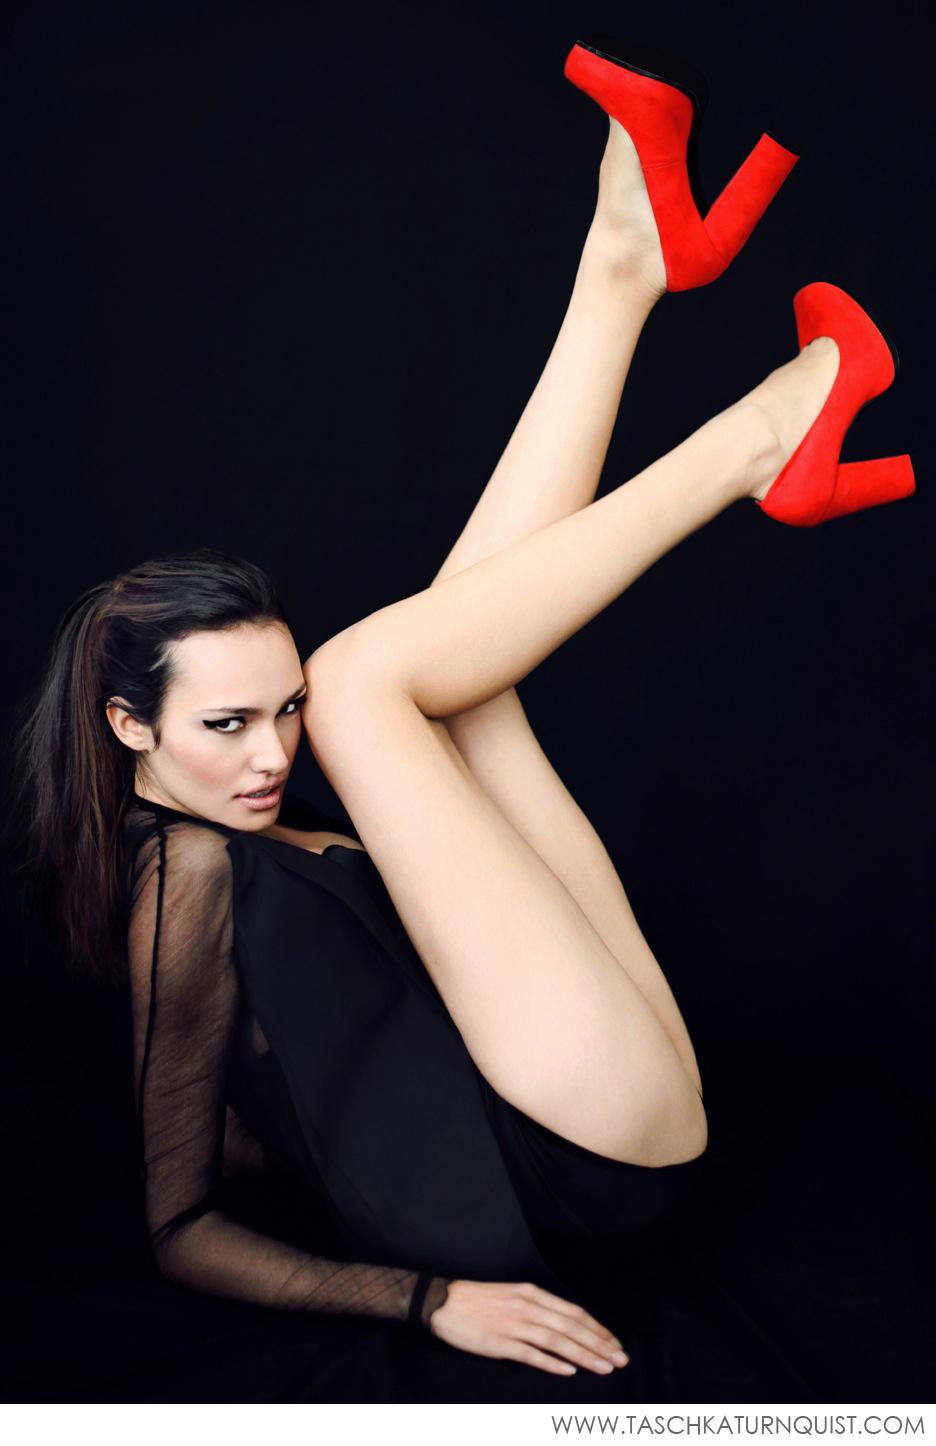 Instagram Erin Heatherton nude (71 foto and video), Ass, Paparazzi, Instagram, cameltoe 2006